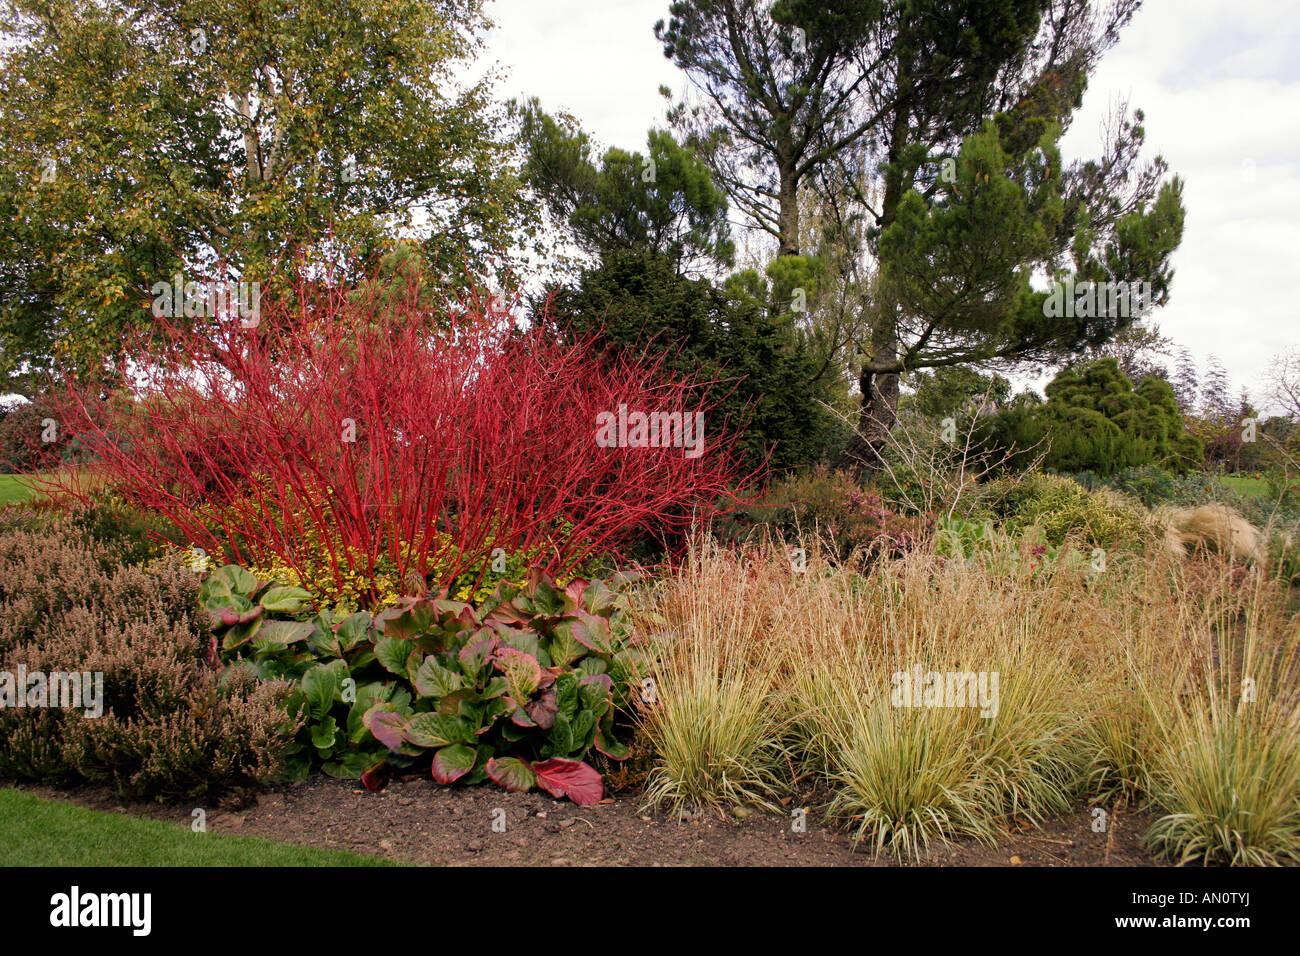 Cornus alba sibirica dogwood in autumn stock photo - Cornus alba sibirica ...